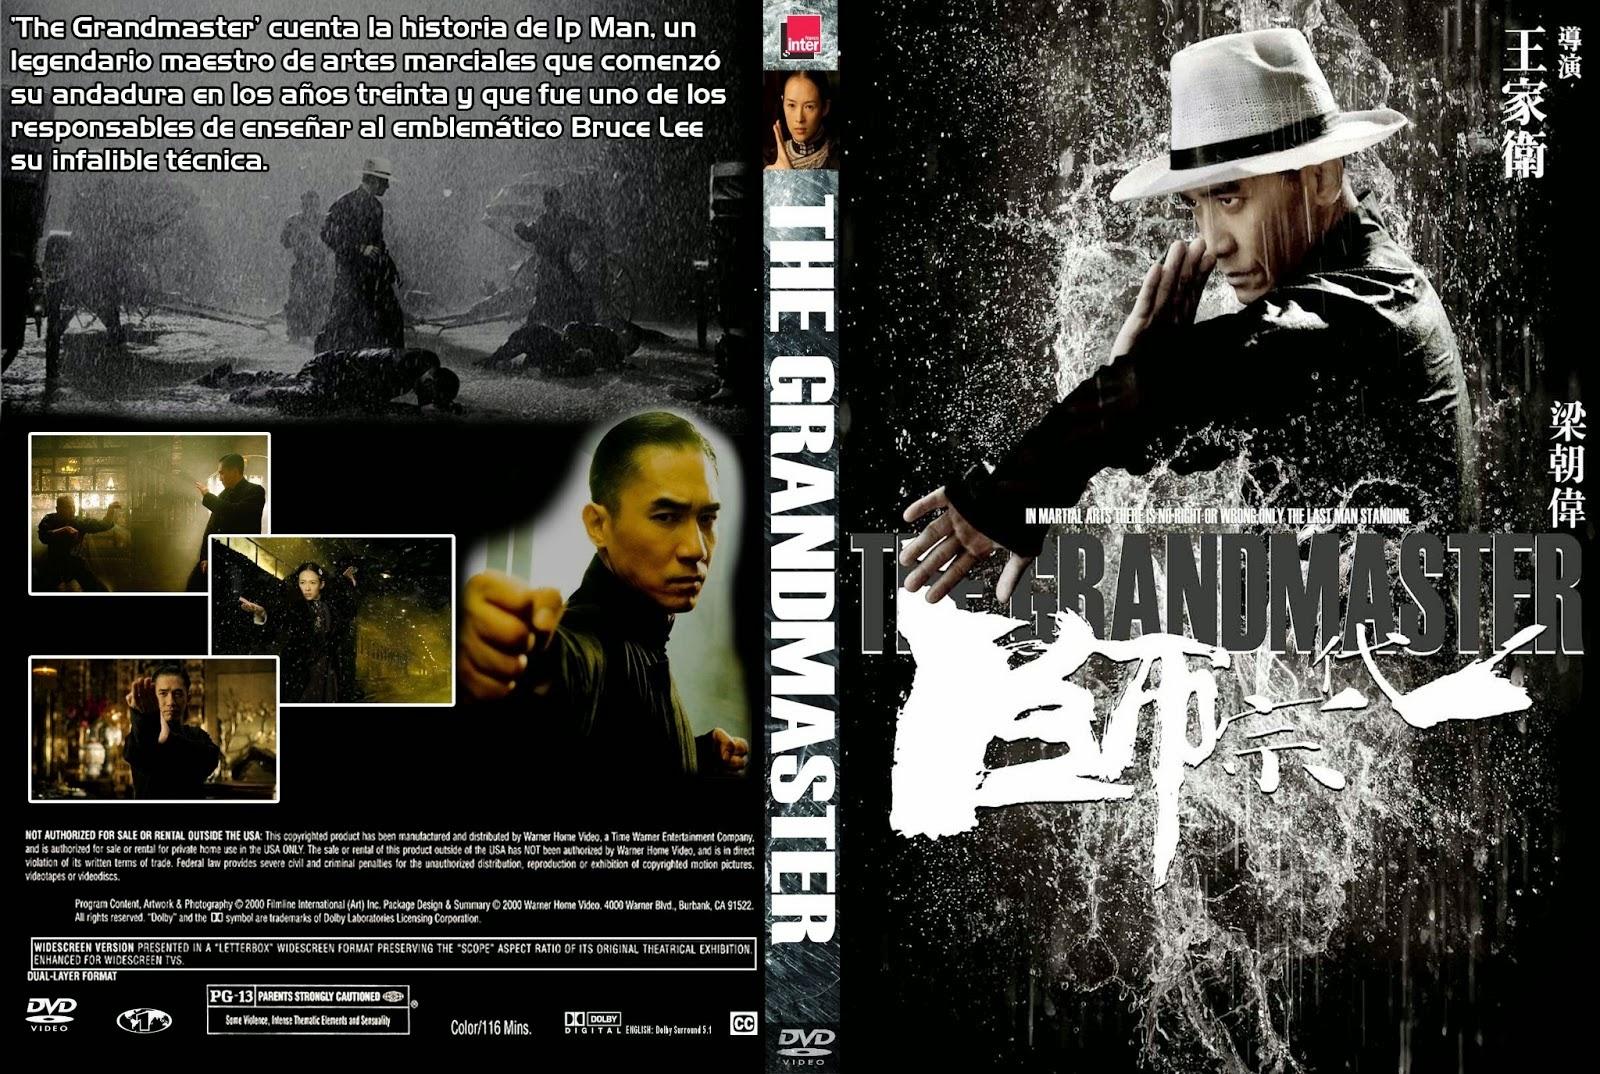 The Grandmaster (Ip Man 4) DVD